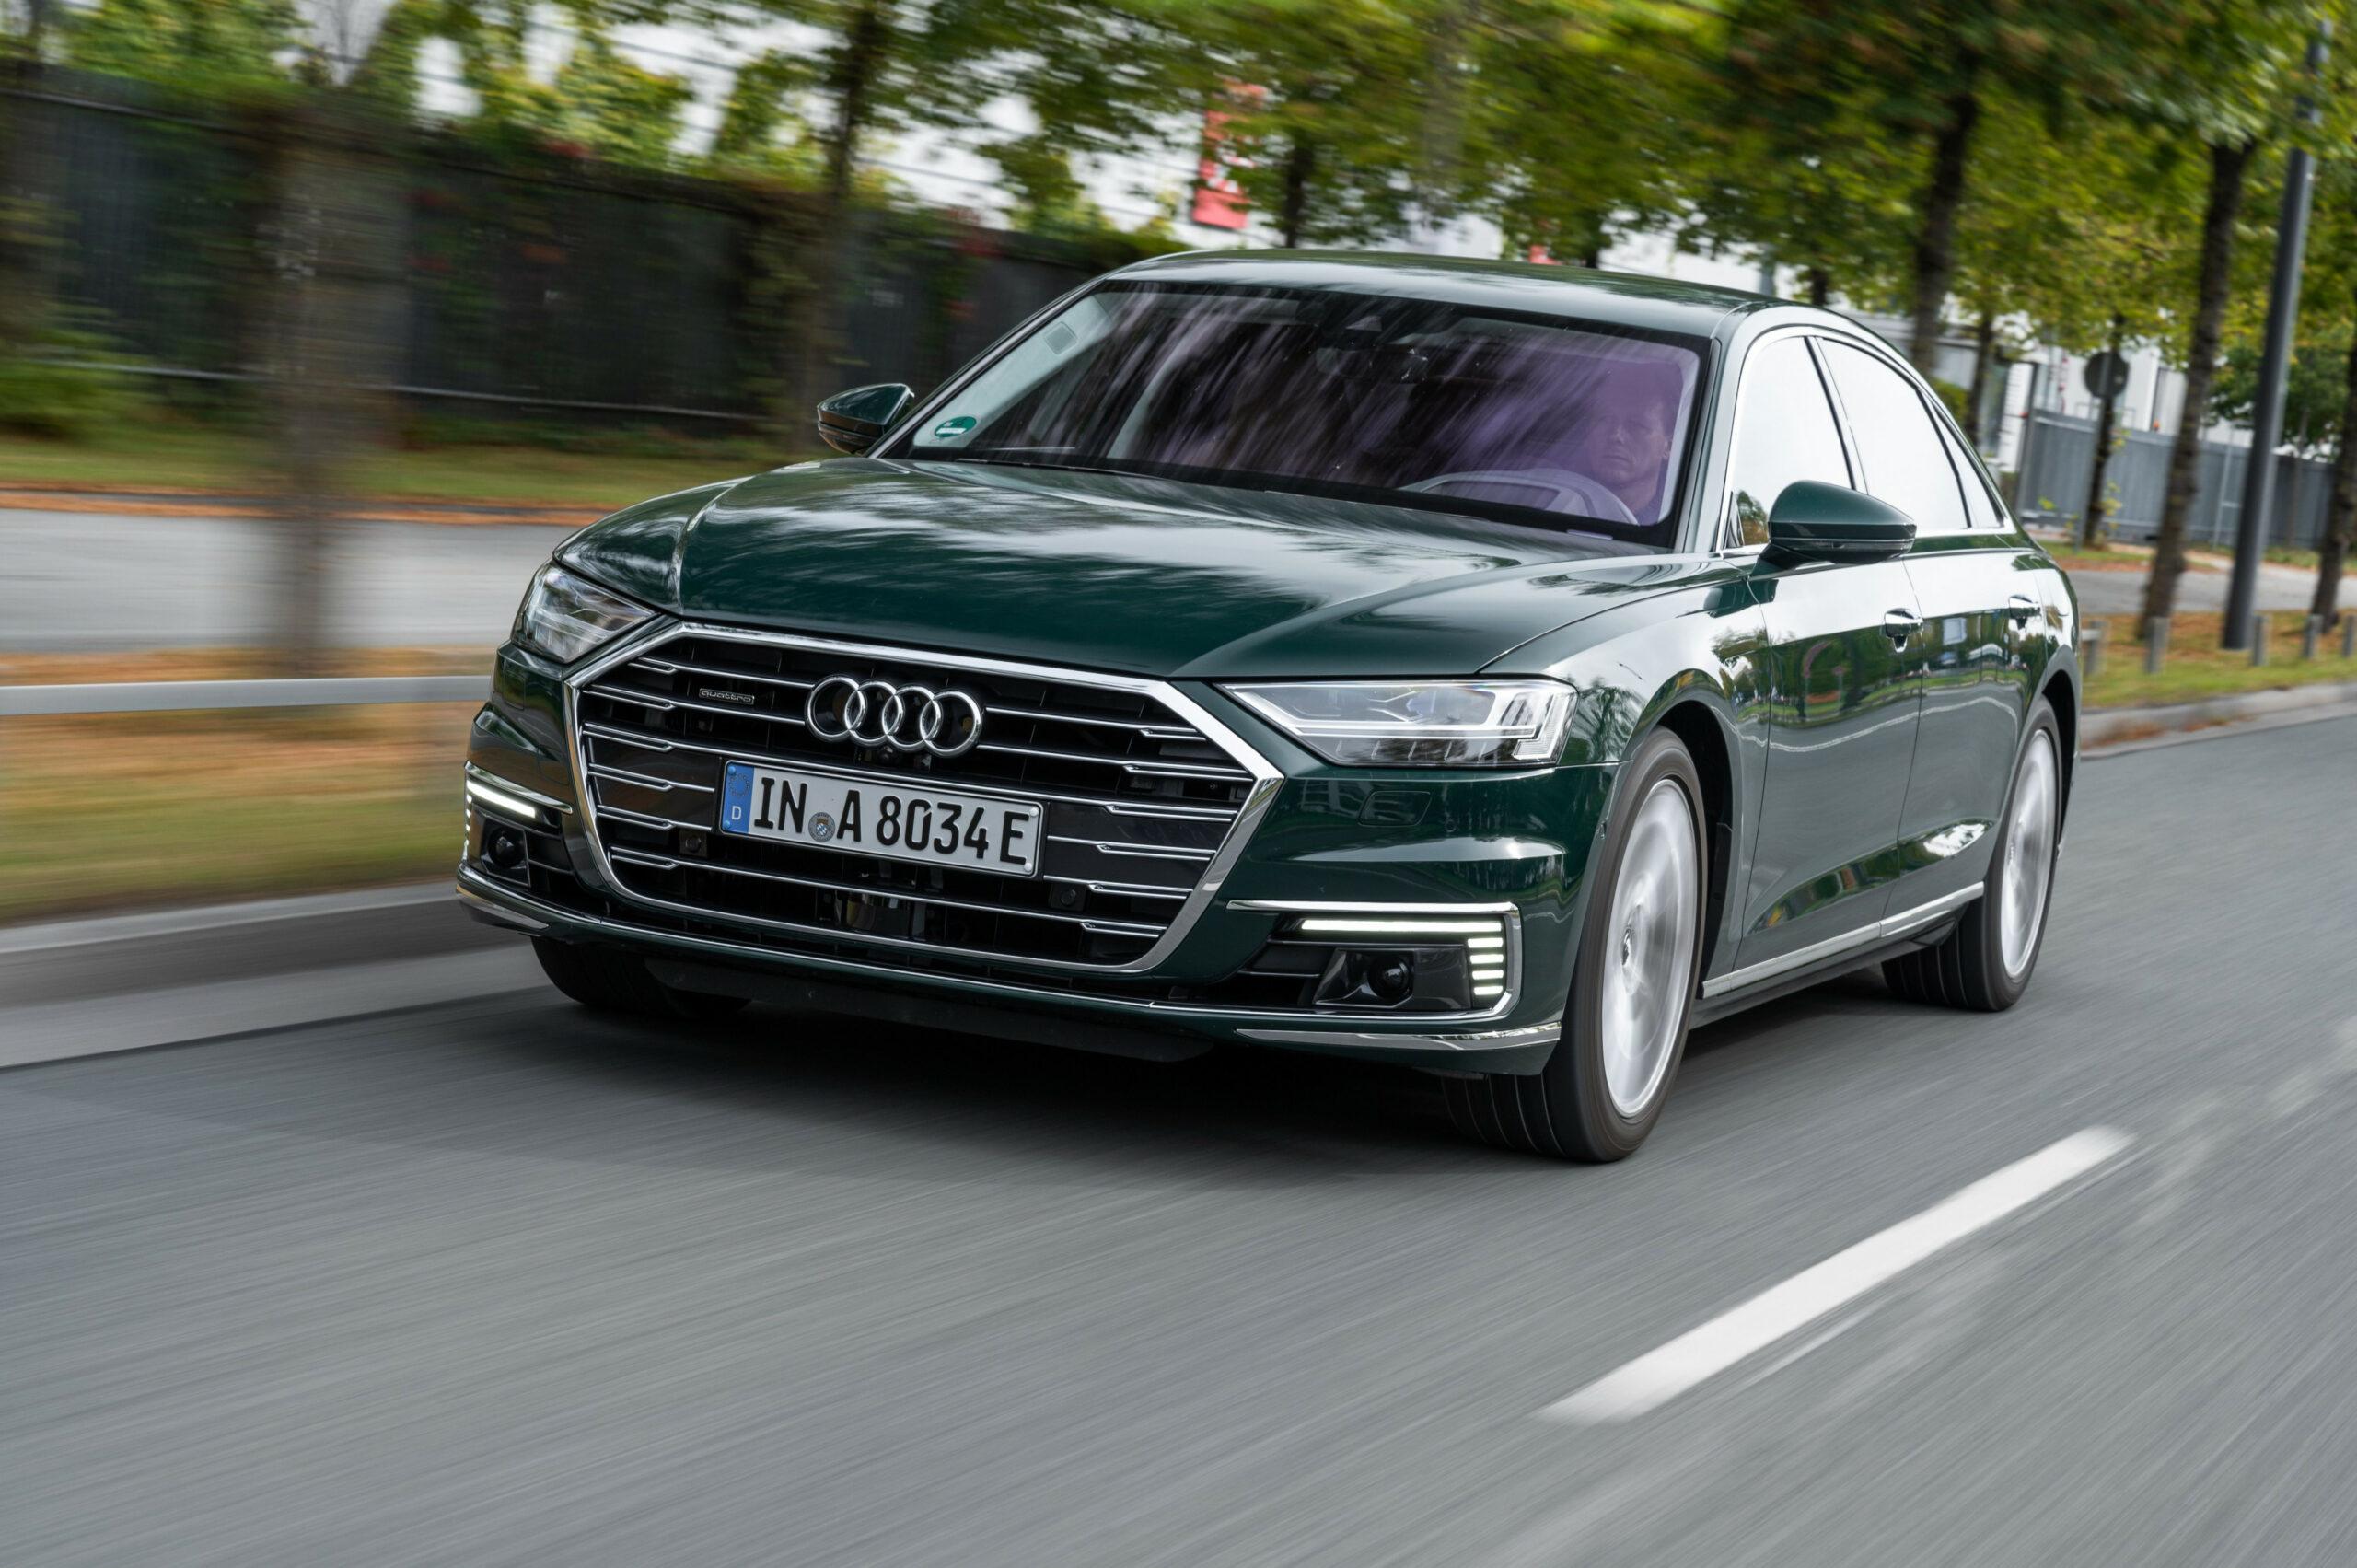 Exterior 2022 Audi A8 L In Usa